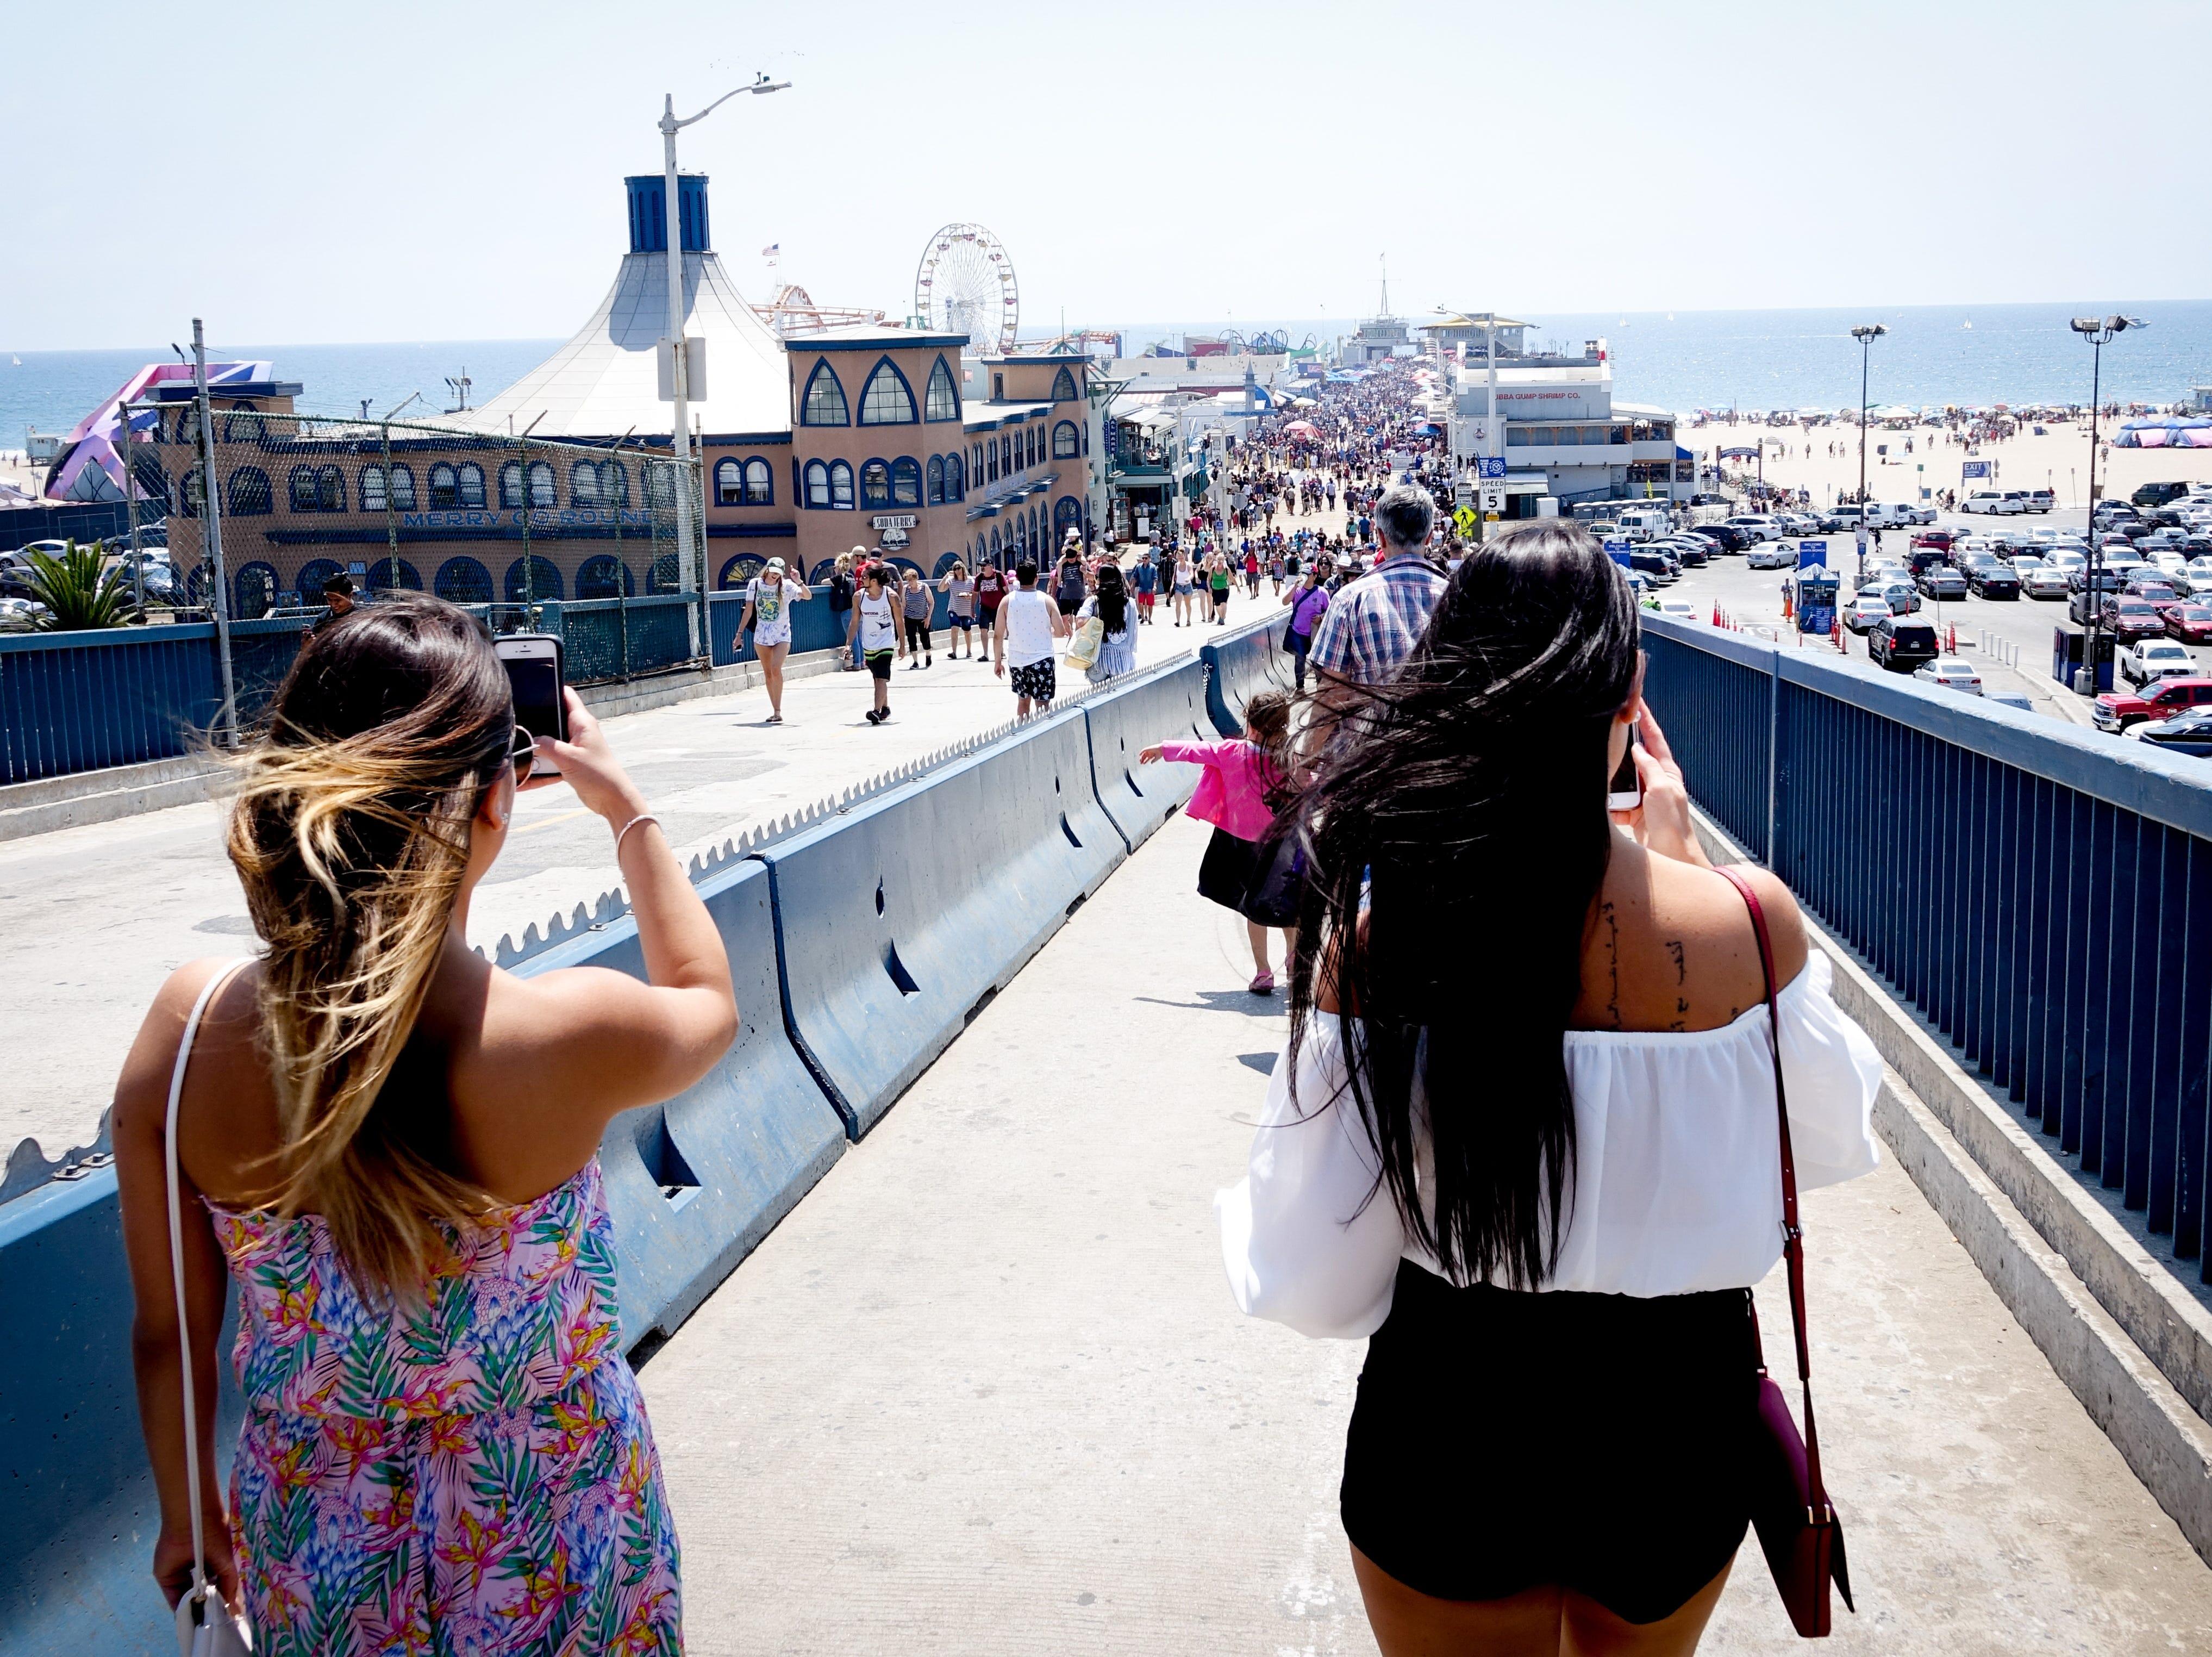 Walking down to the Santa Monica Pier